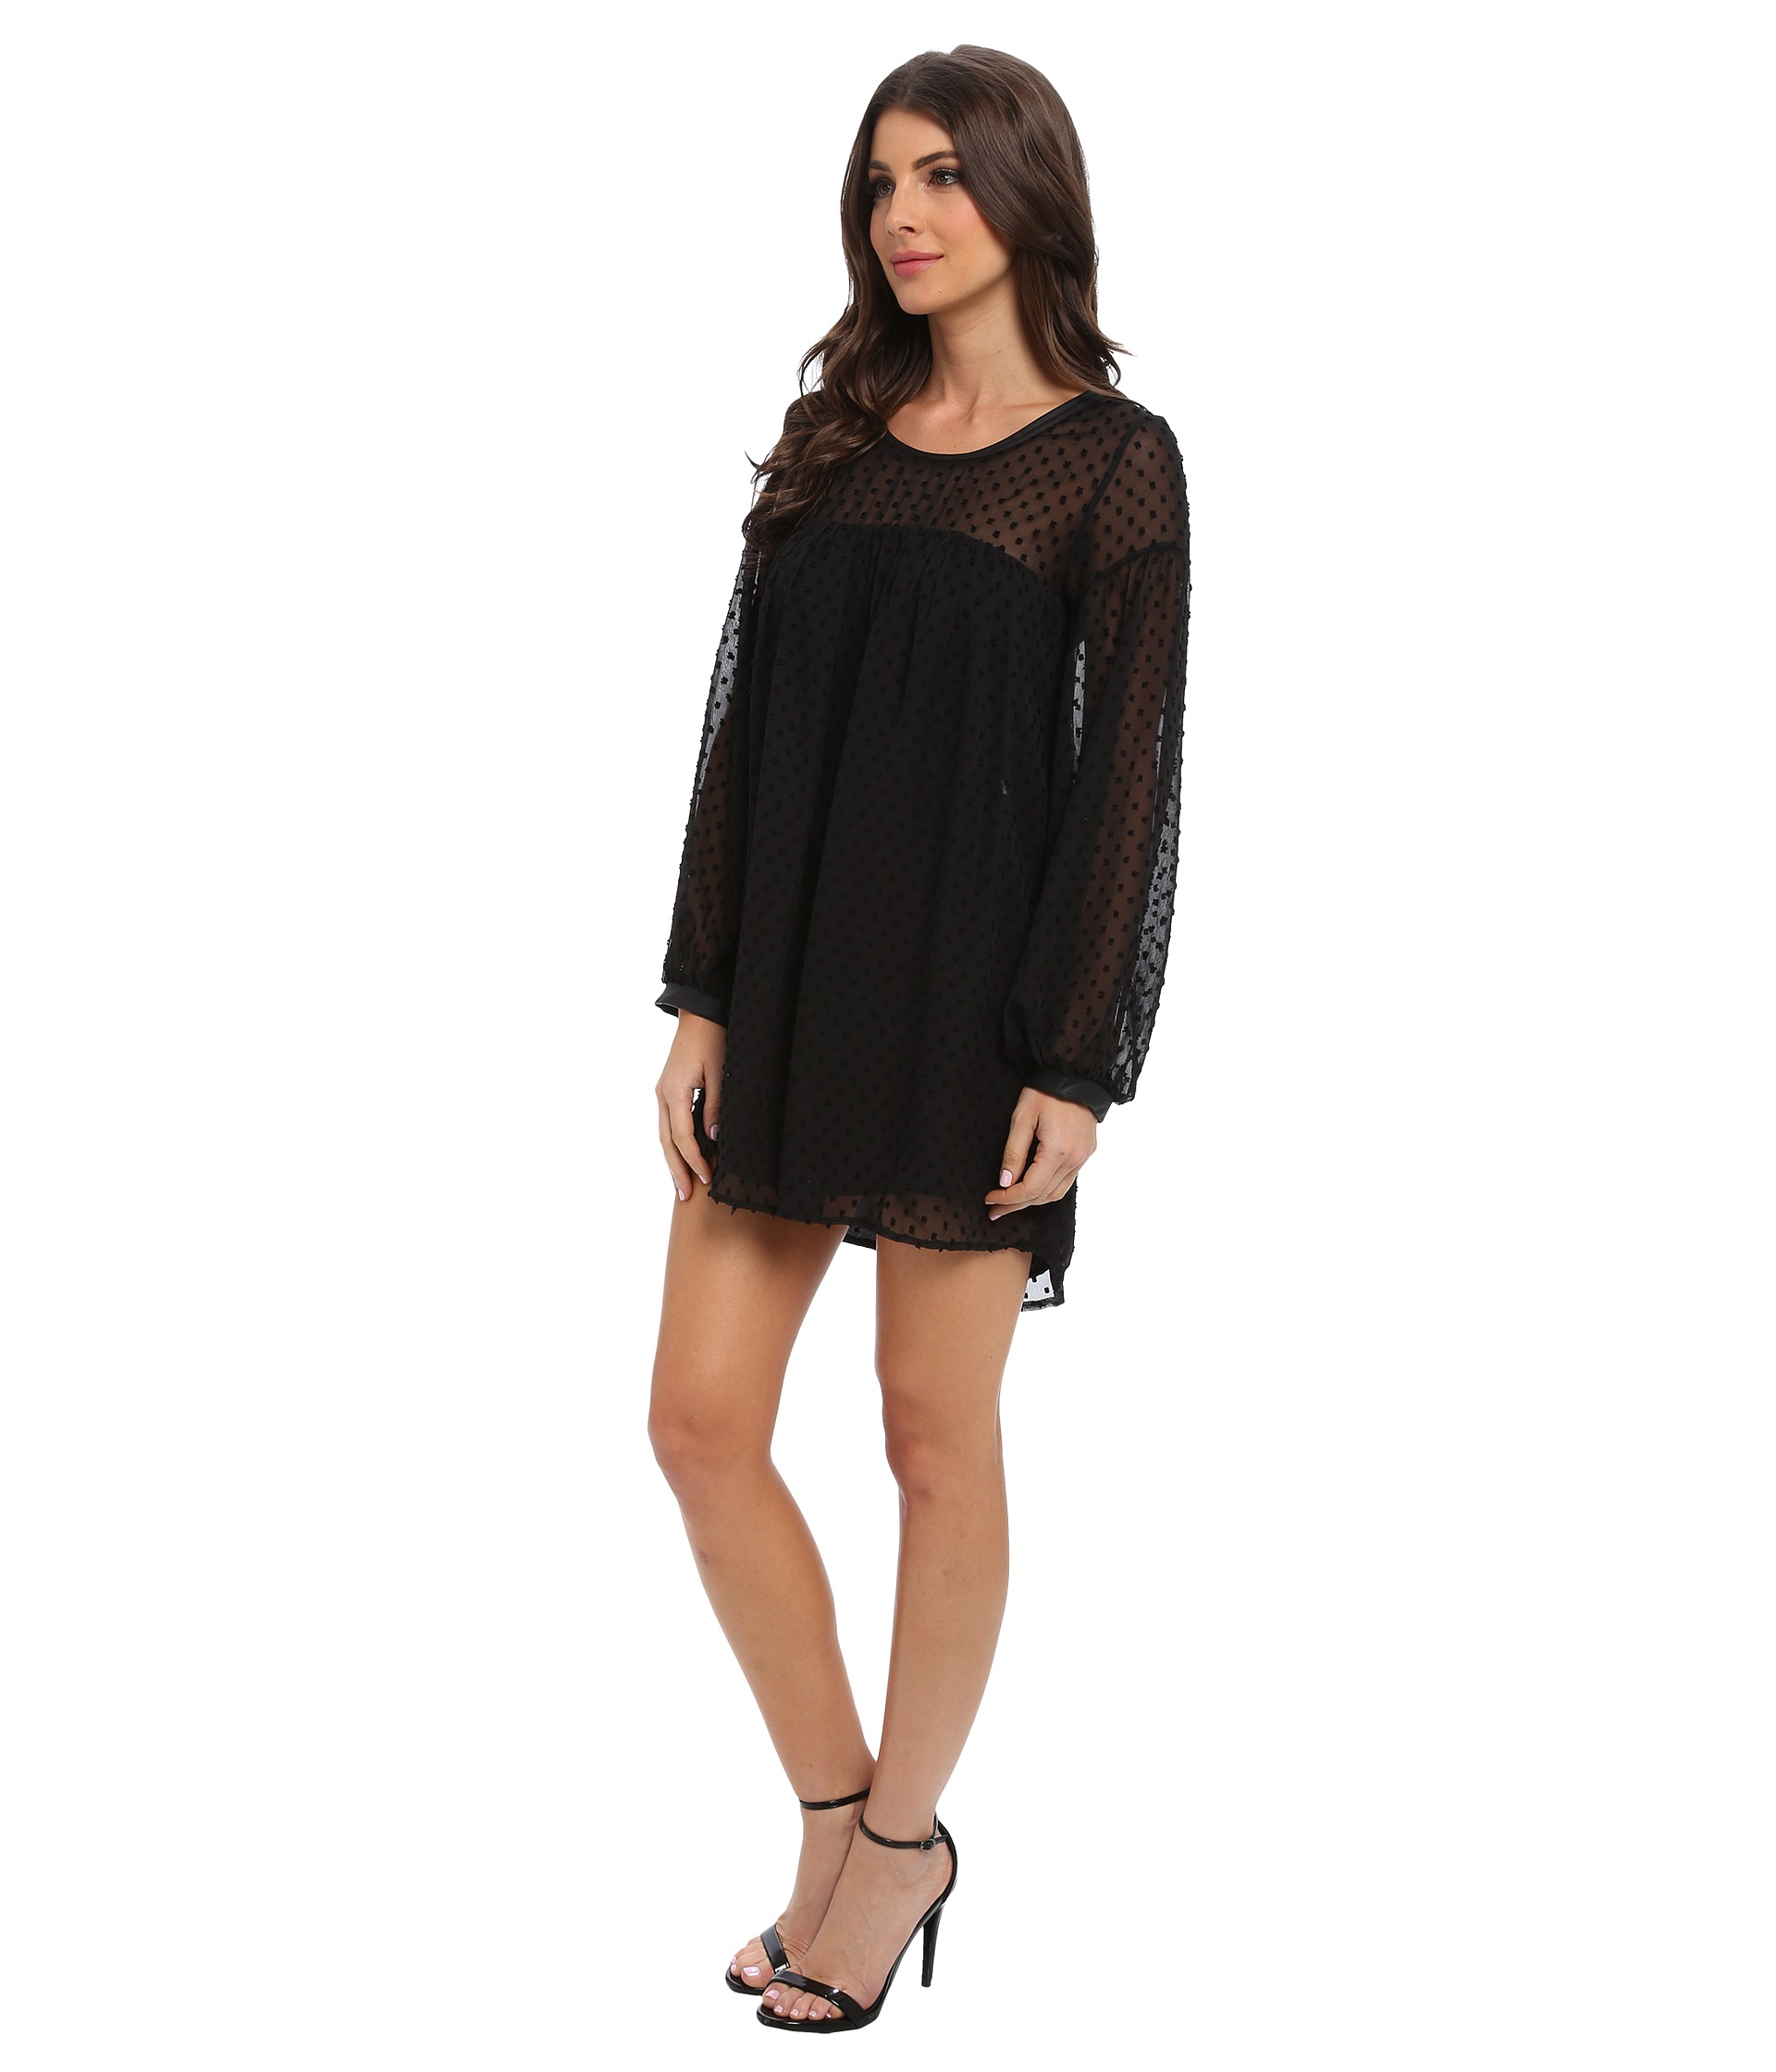 T bags Dot Chiffon Baby Doll Dress in Black ZI11 Print